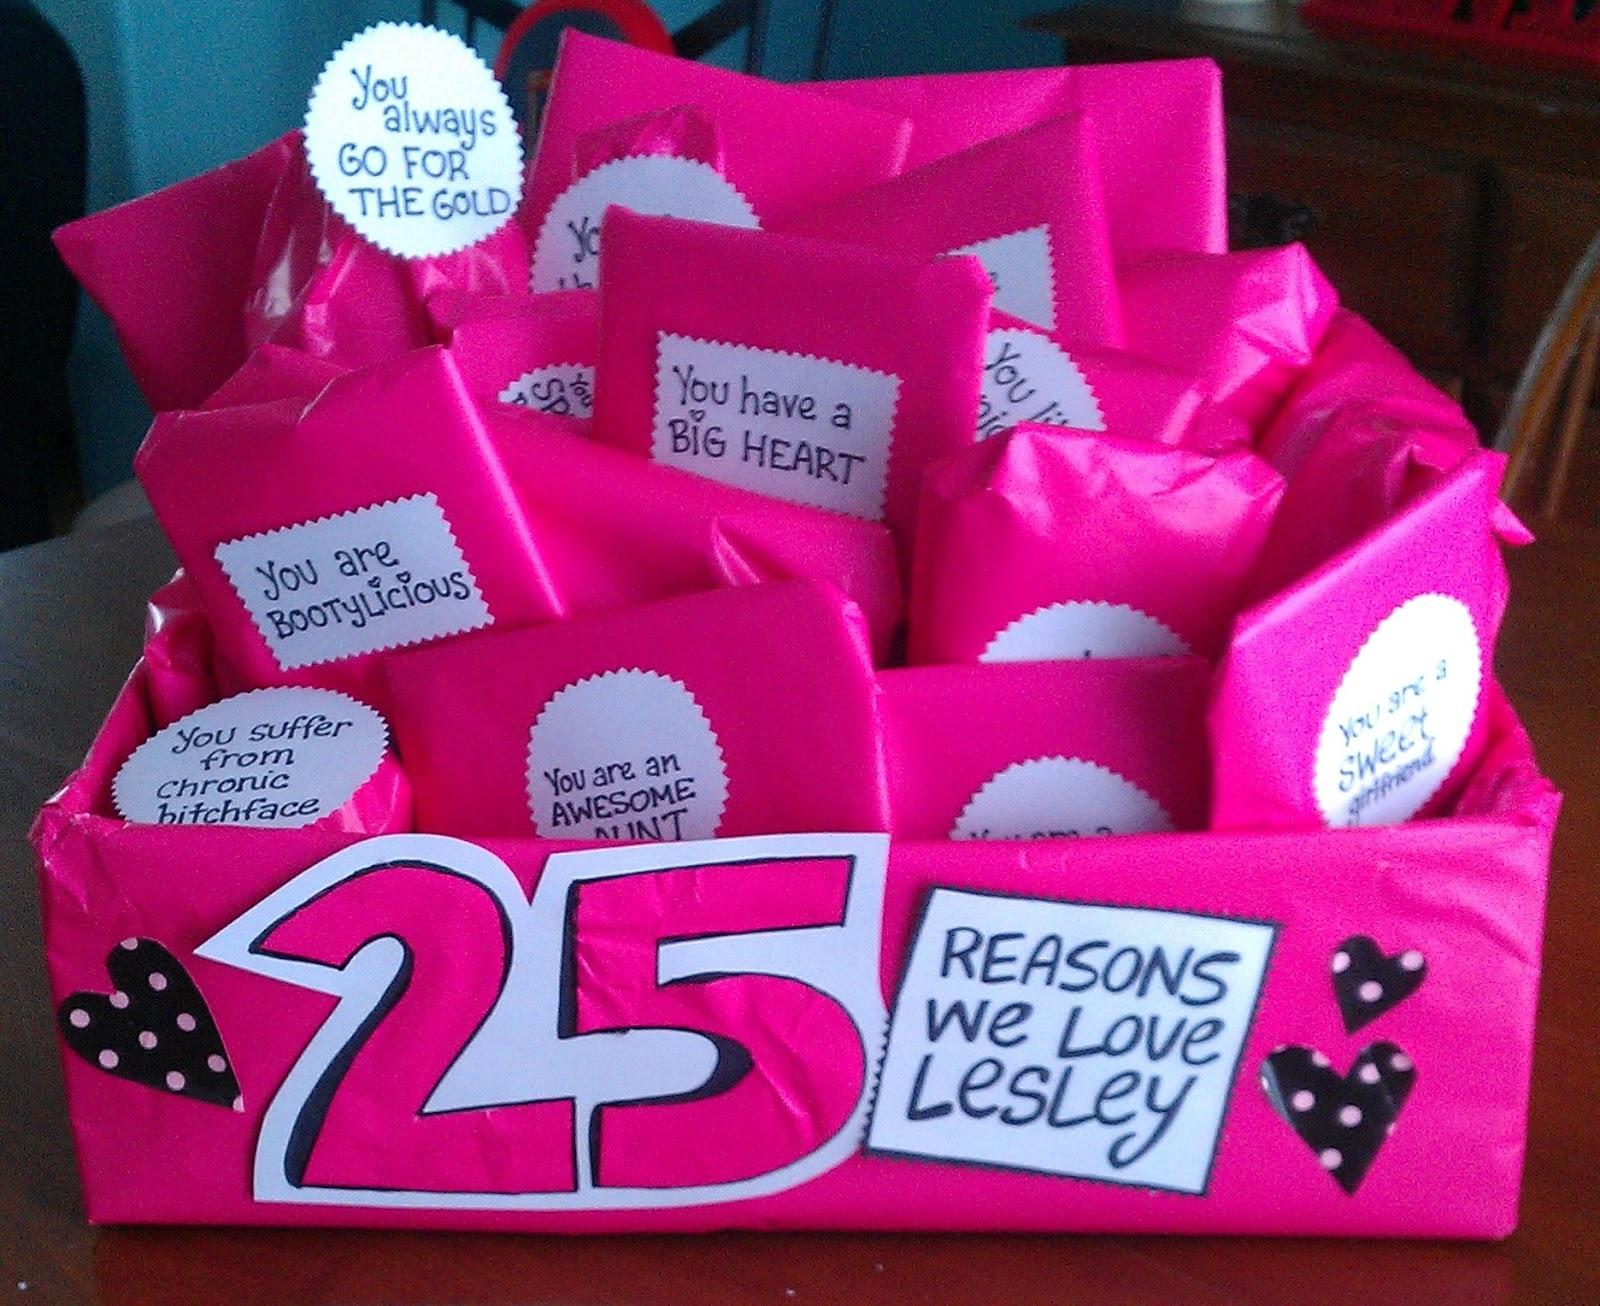 Laptops to Lullabies: Fun gift idea: 25 reasons we love you